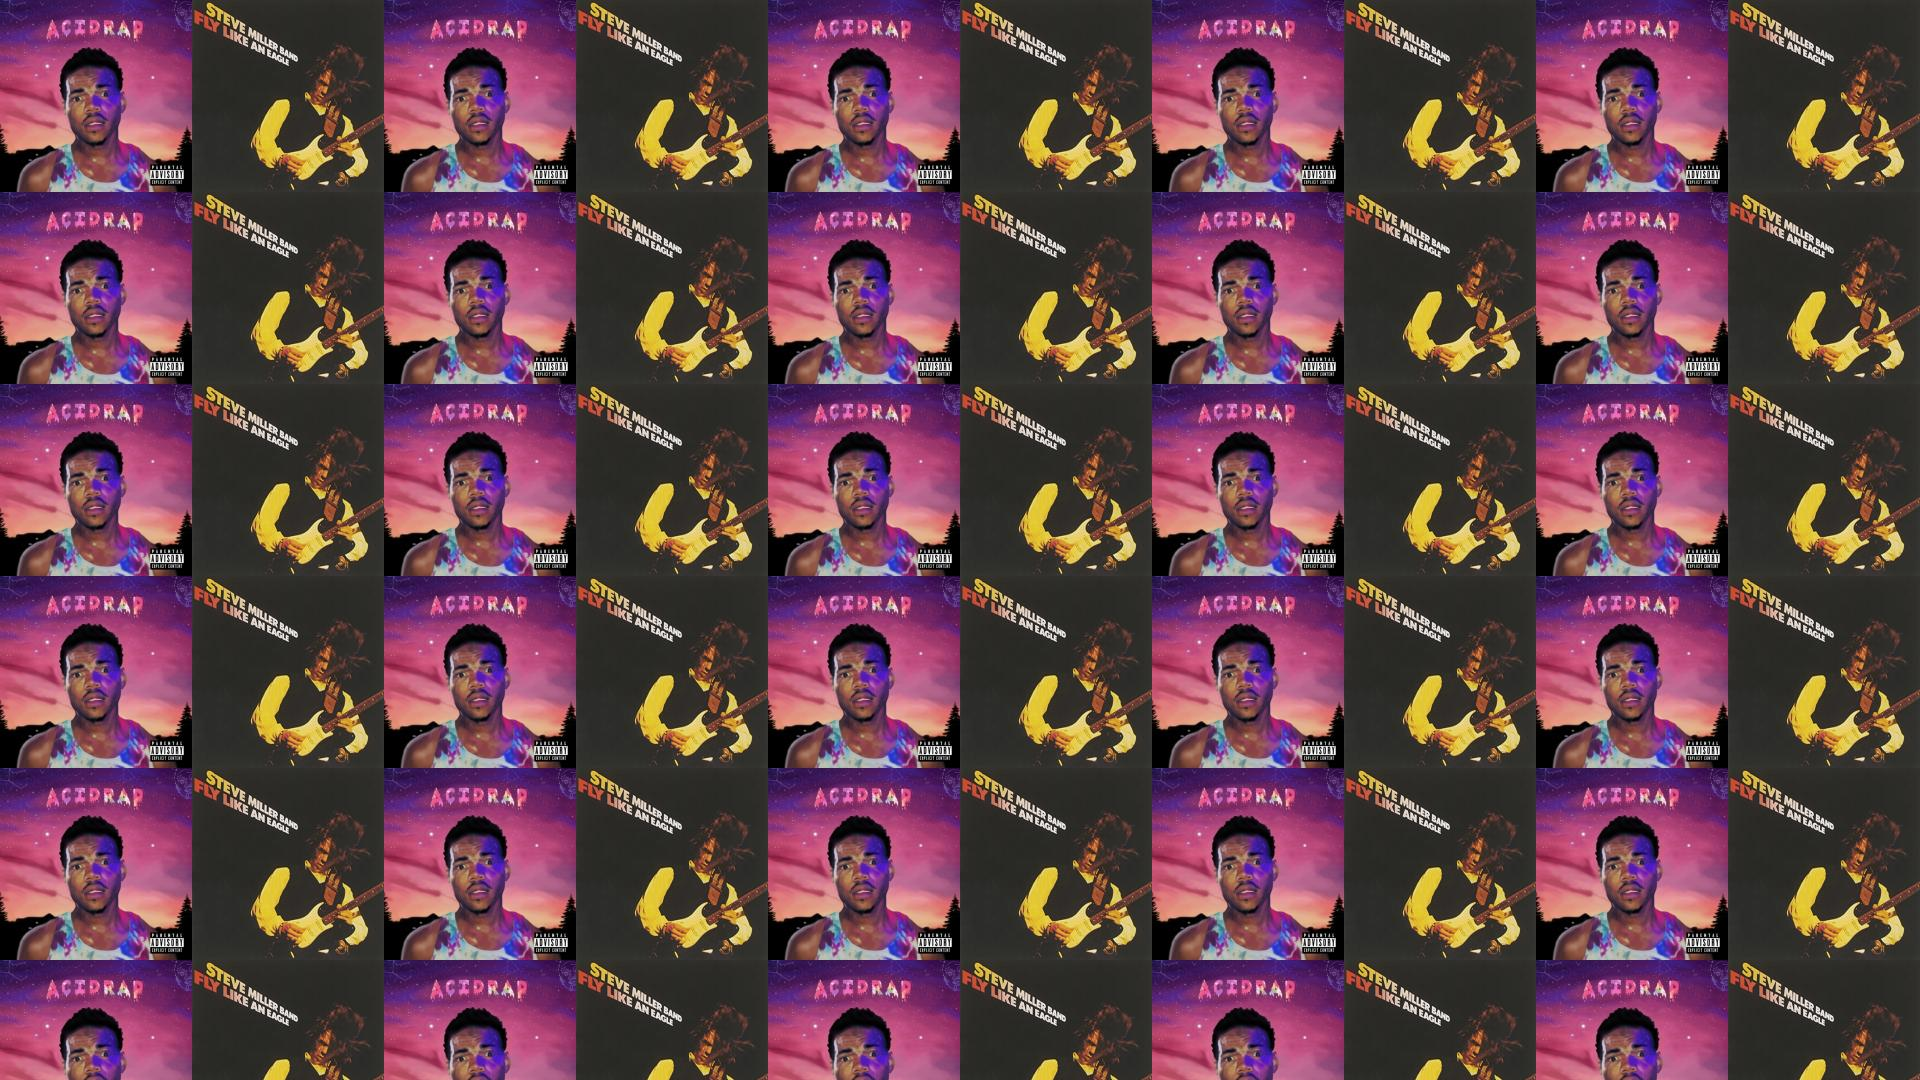 Chance Rapper Acid Rap Steve Miller Band Fly Wallpaper Tiled Desktop